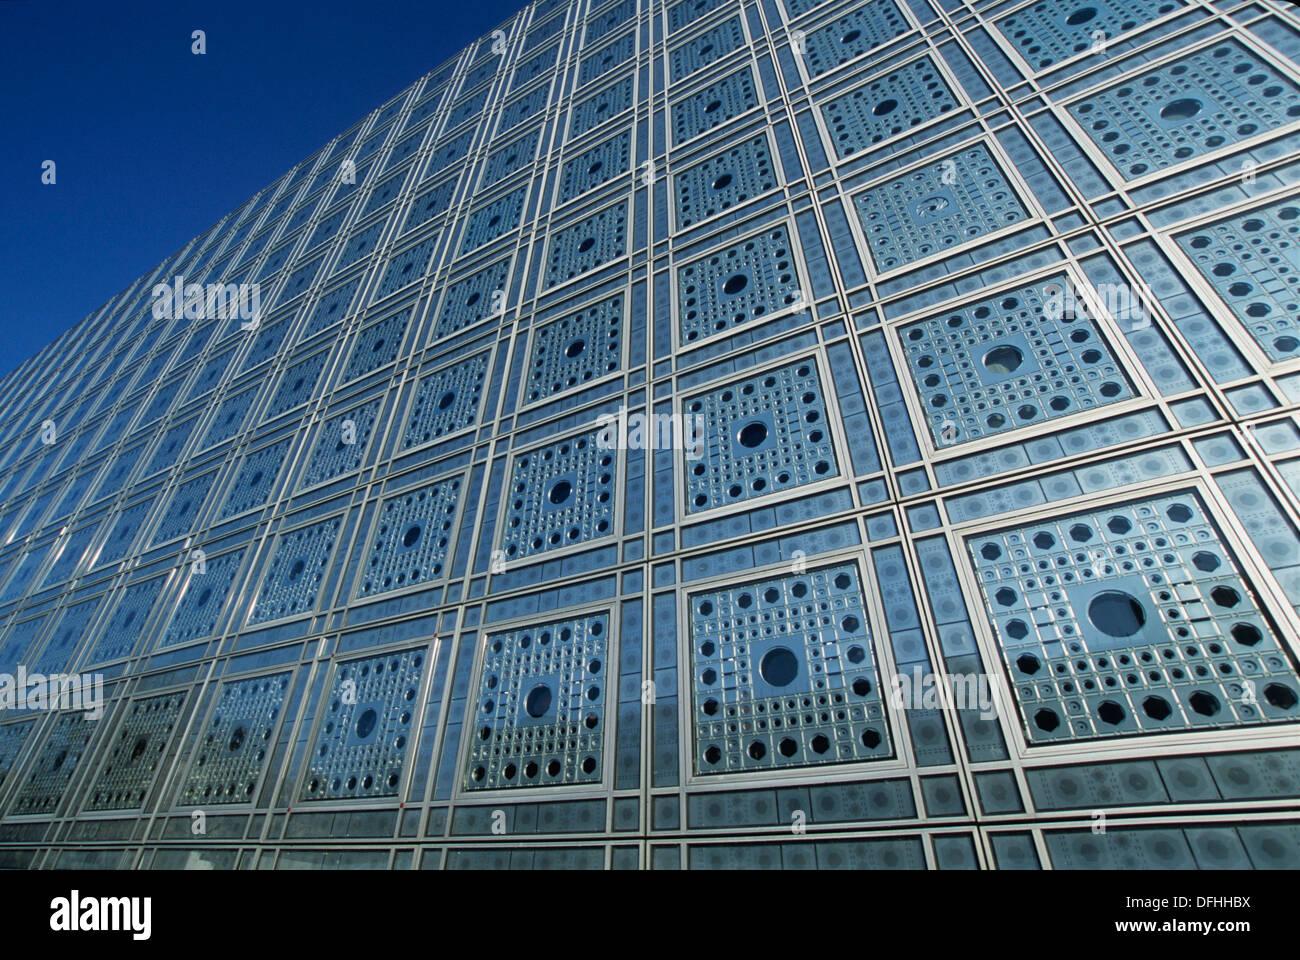 Ima institut du monde arabe architect jean nouvel for Architecture jean nouvel